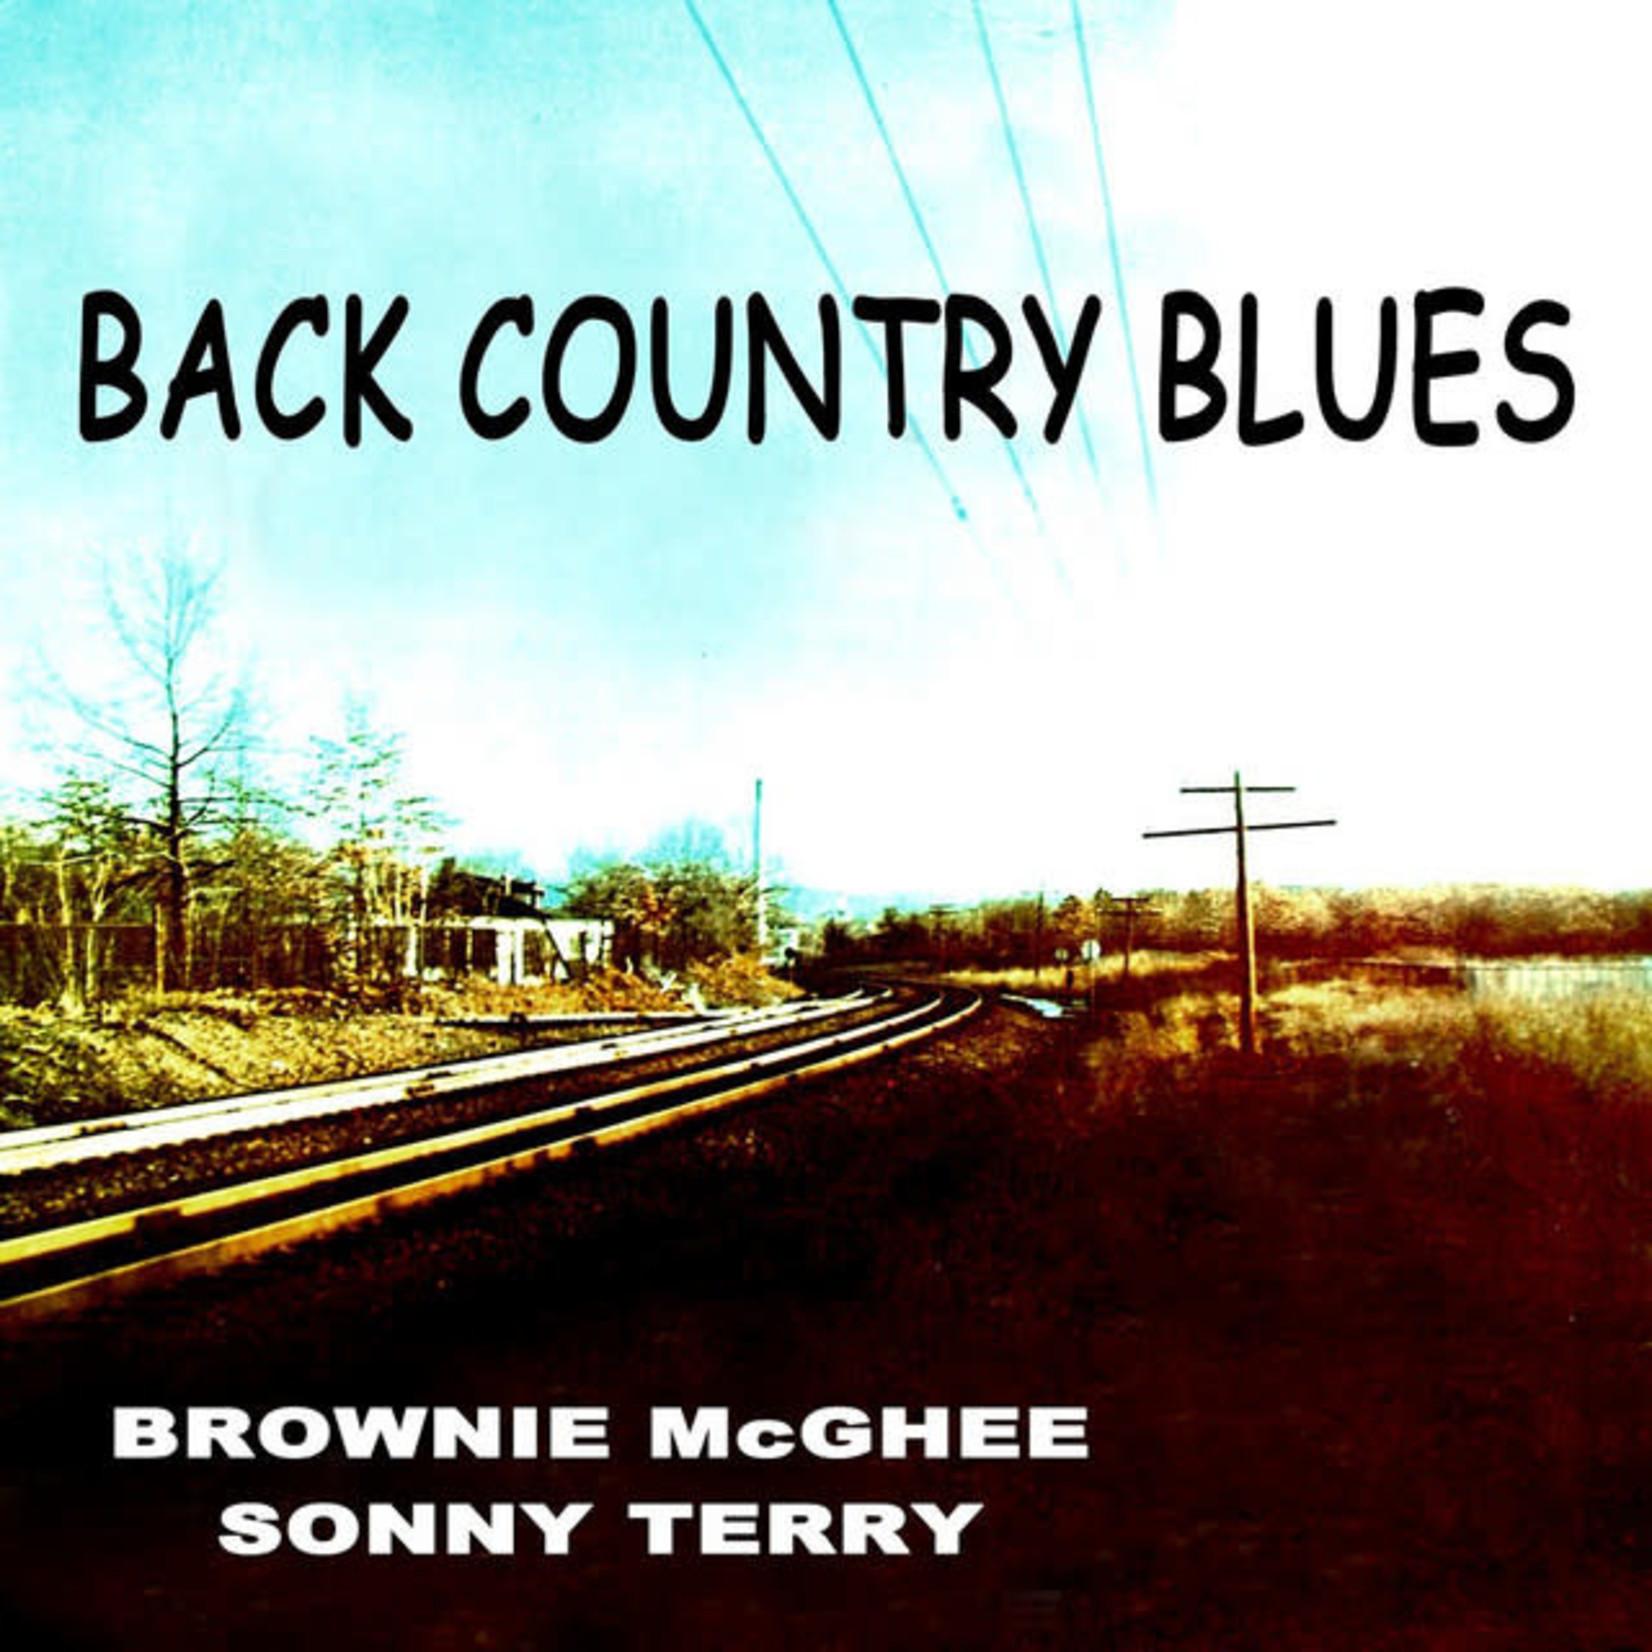 Vinyl Brownie McGhee & Sonny Terry - Back Country Blues.   Final Sale